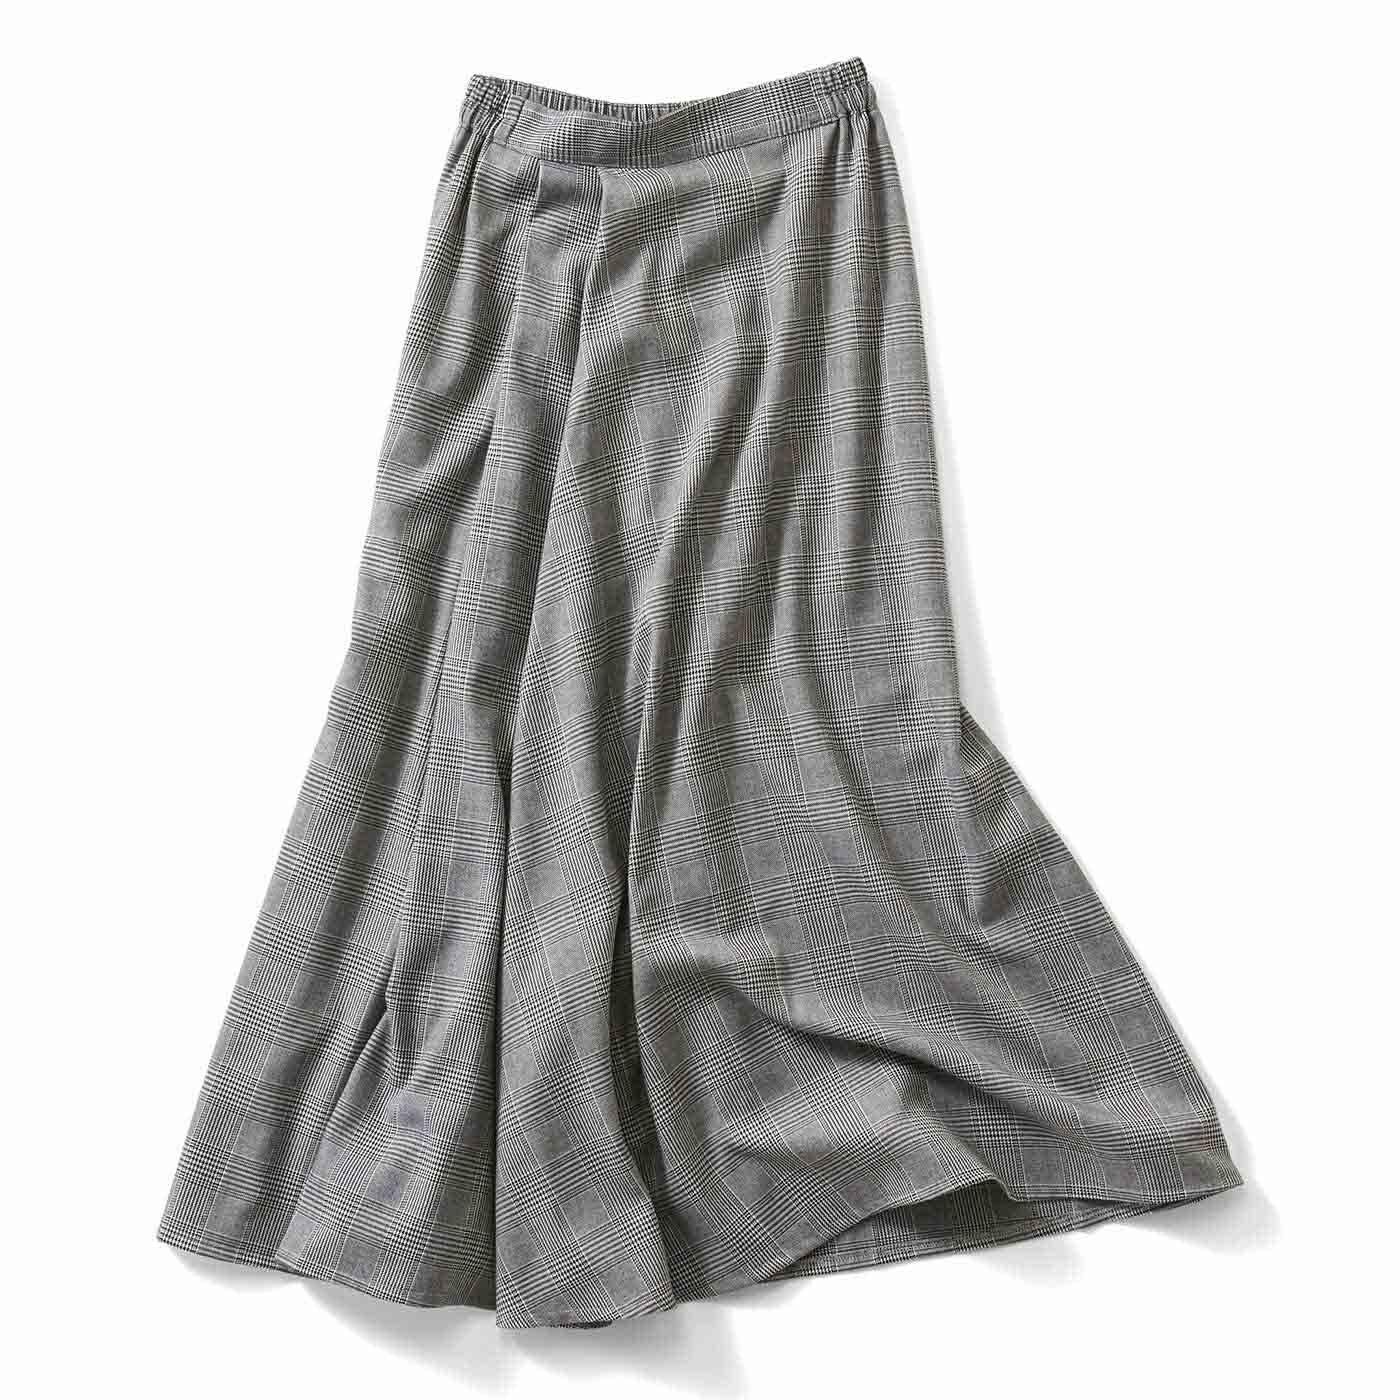 IEDIT[イディット] タックデザインのチェック柄マキシスカート〈ブラック〉